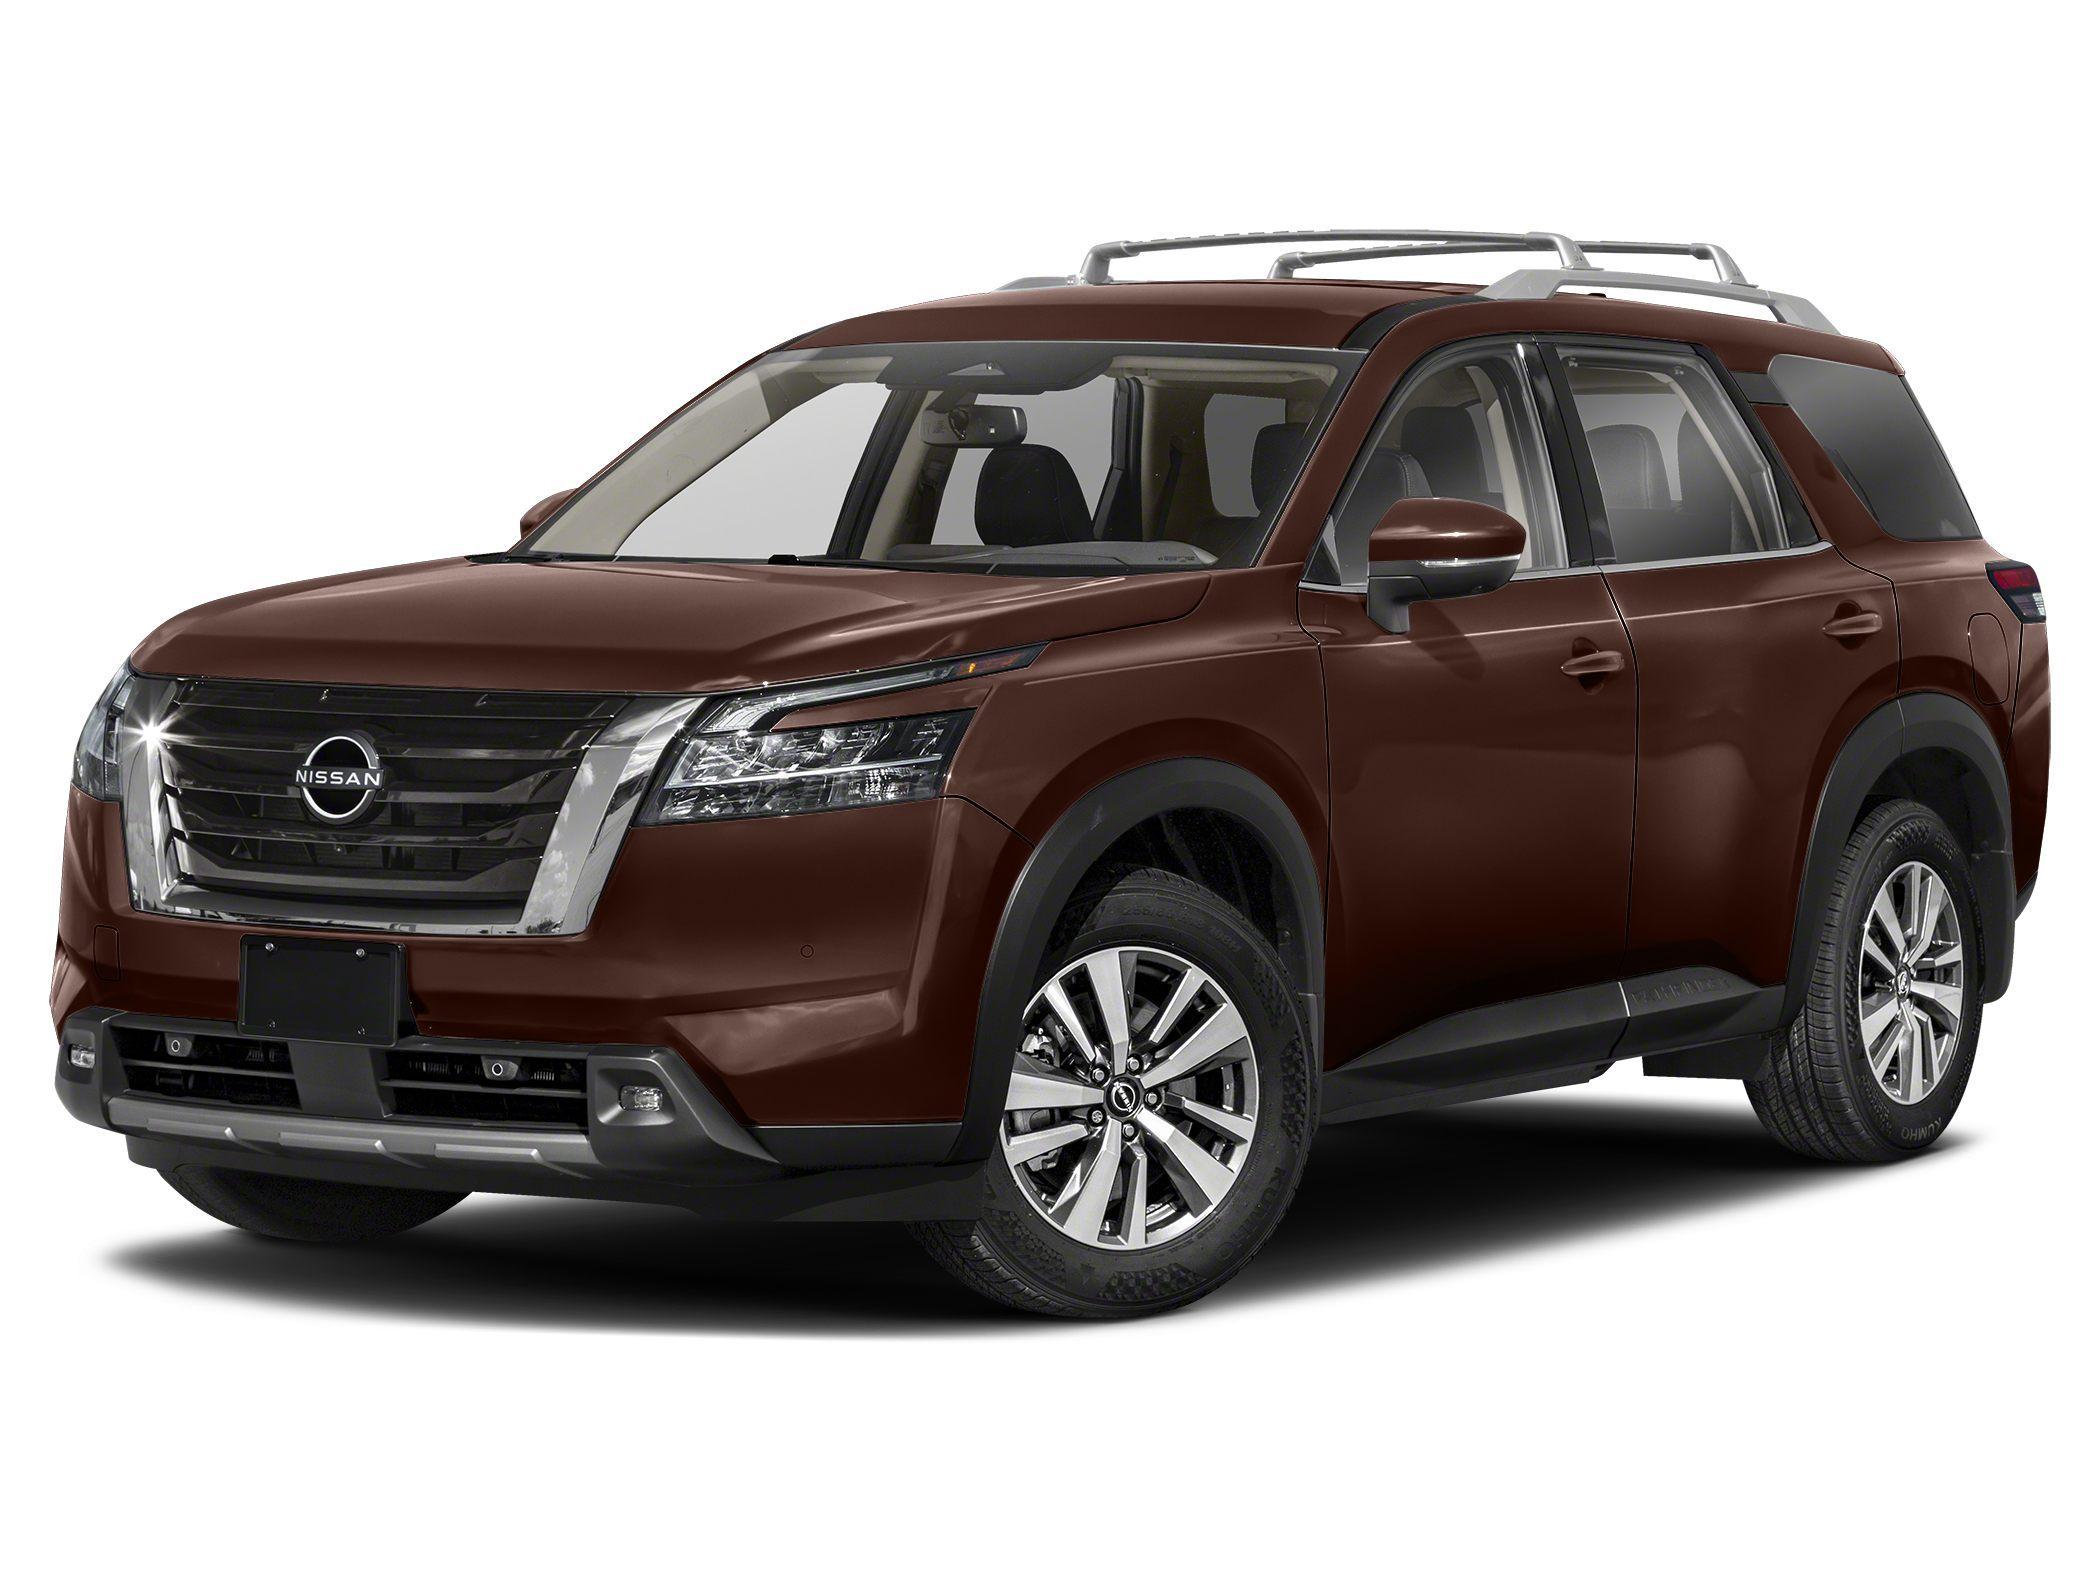 2022 Nissan Pathfinder SUV